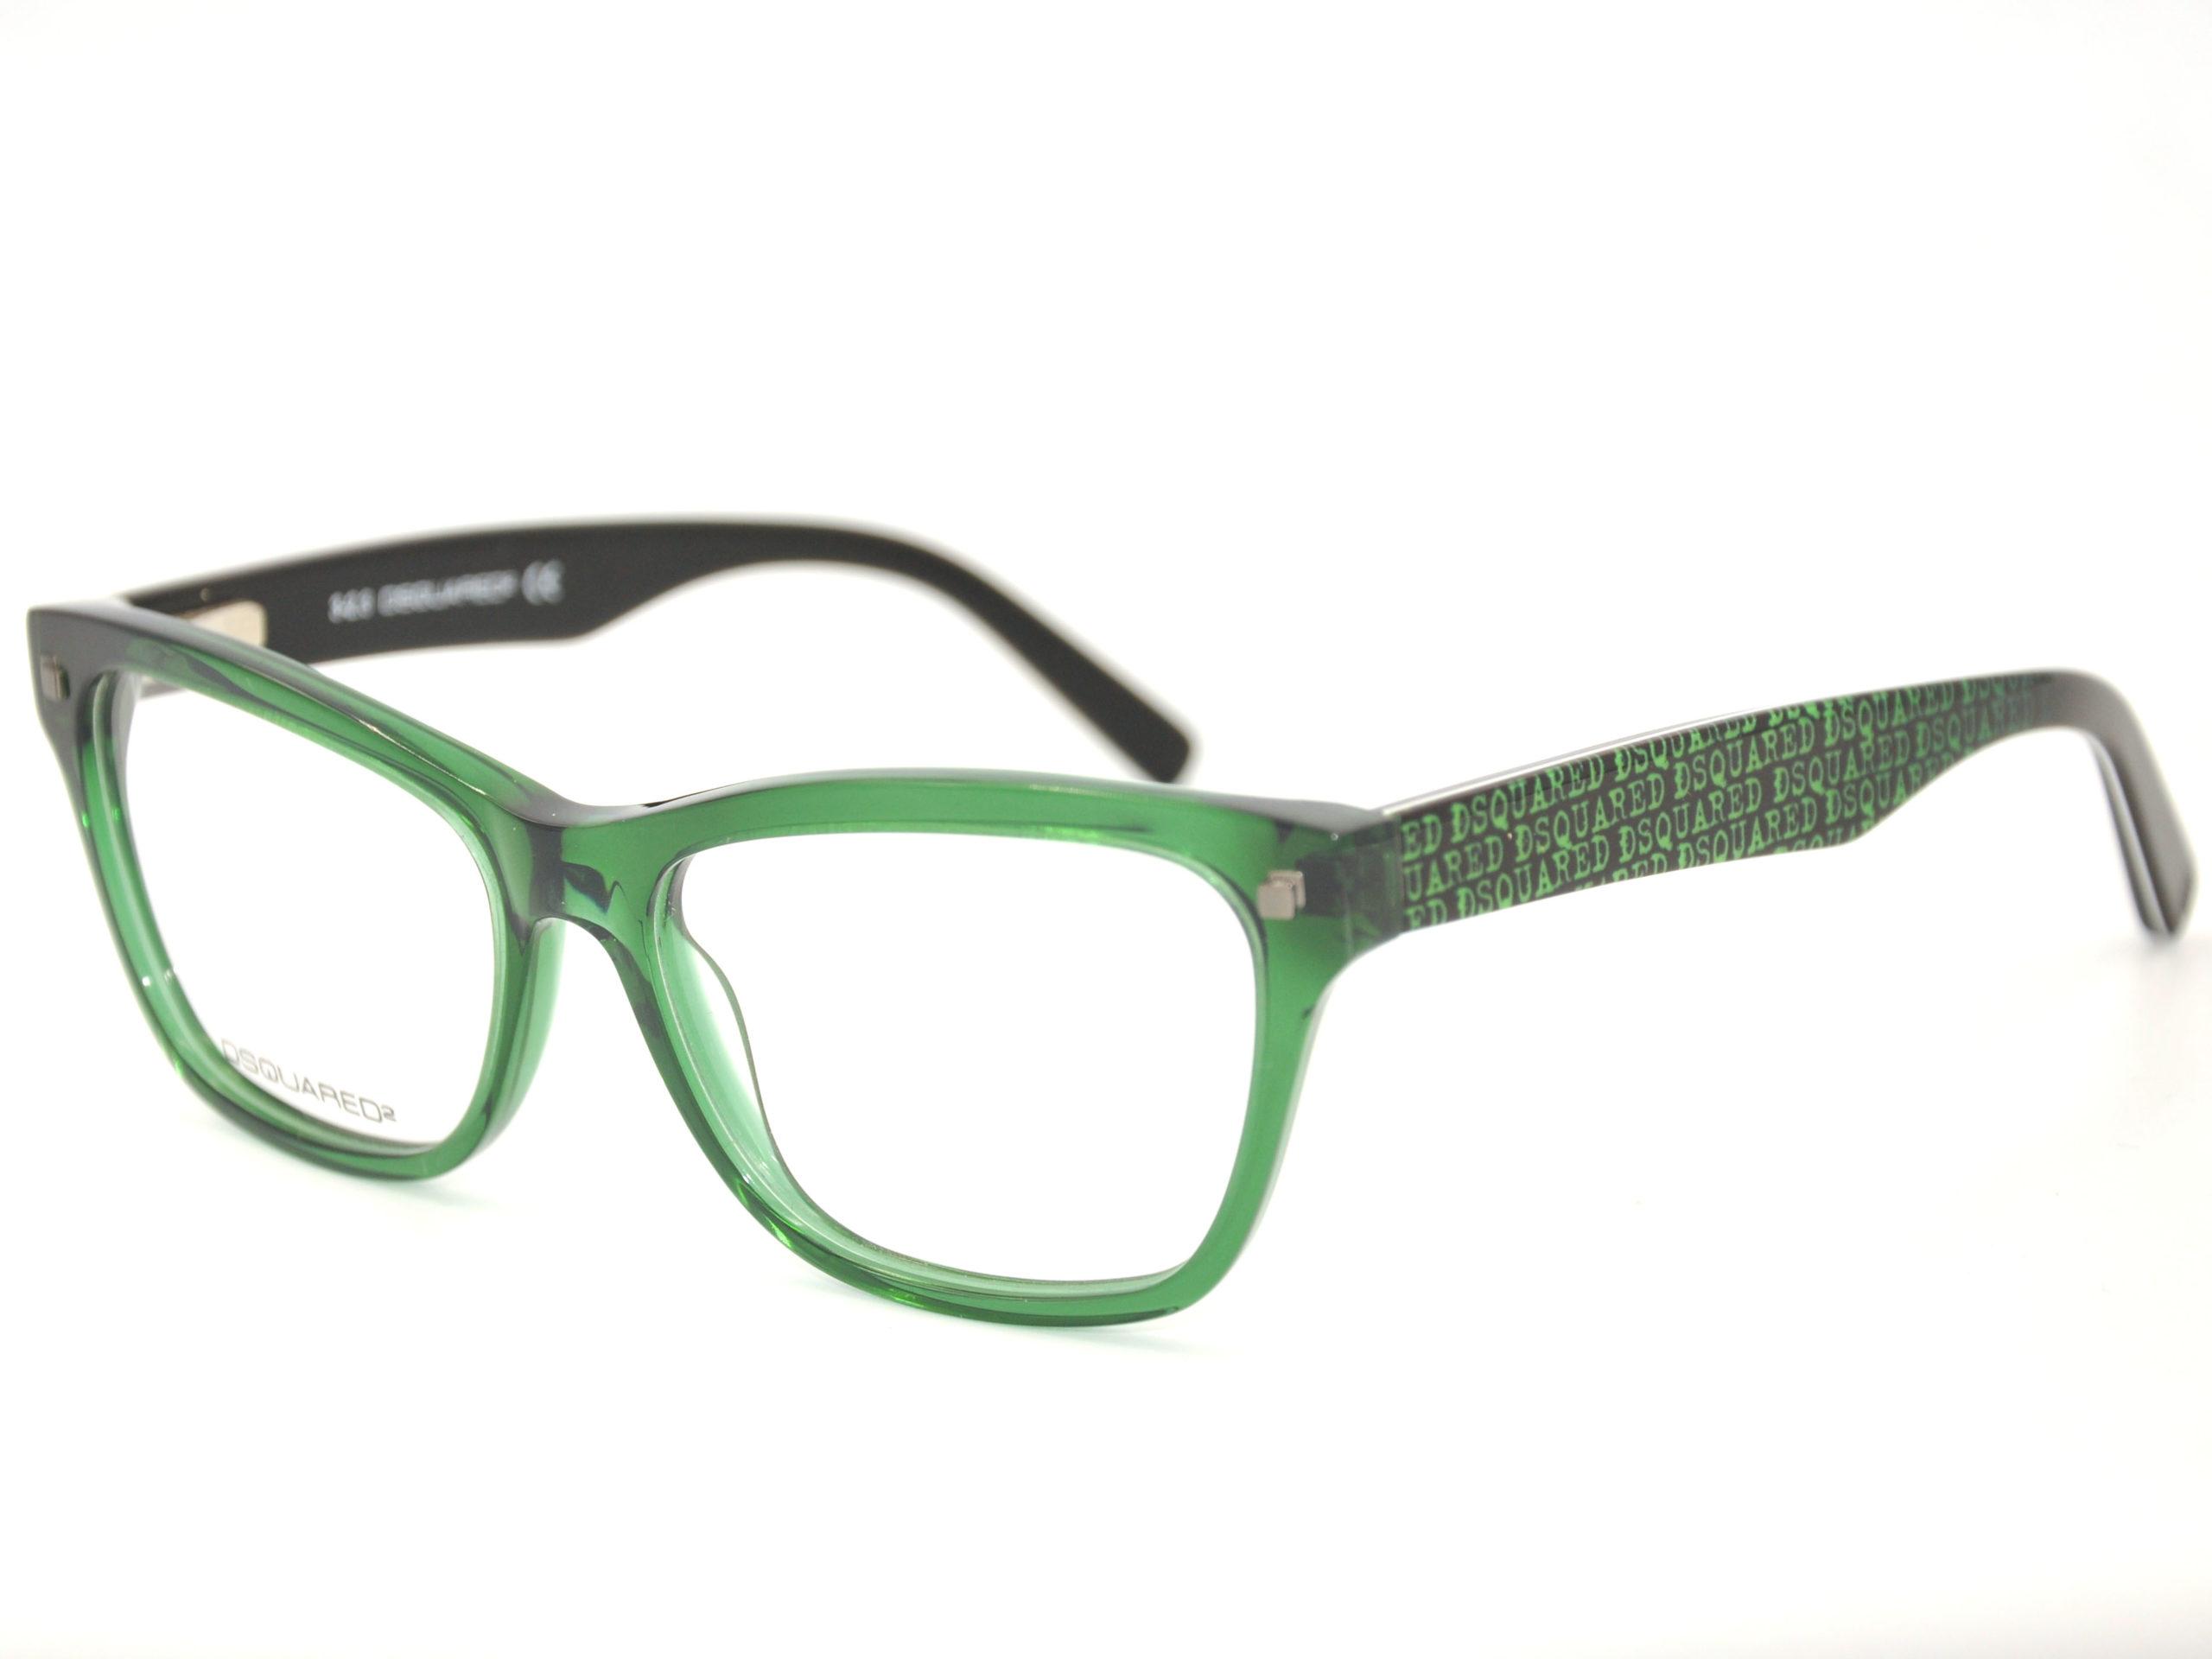 DSquared 2 DQ5138 096 Prescription GlassesΣ 2018